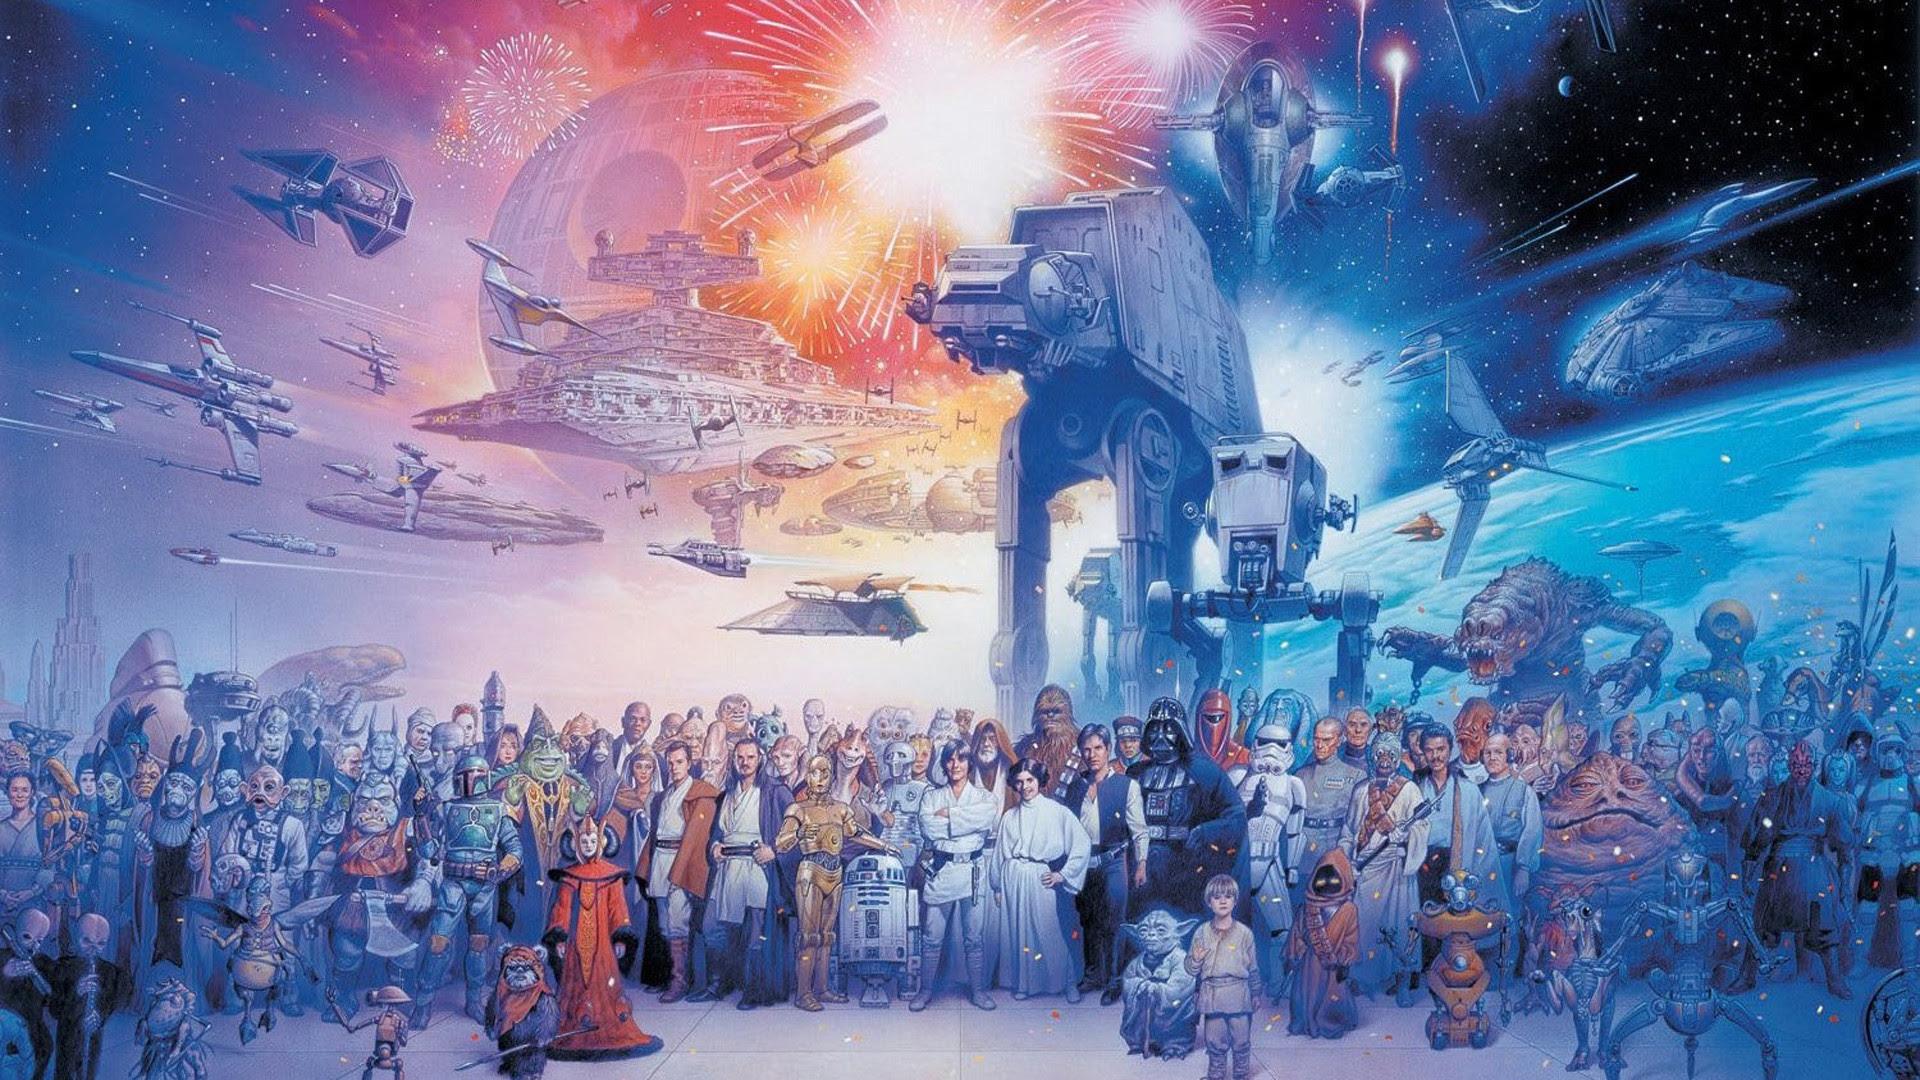 Ultra Hd Star Wars Desktop Wallpaper 1920x1080